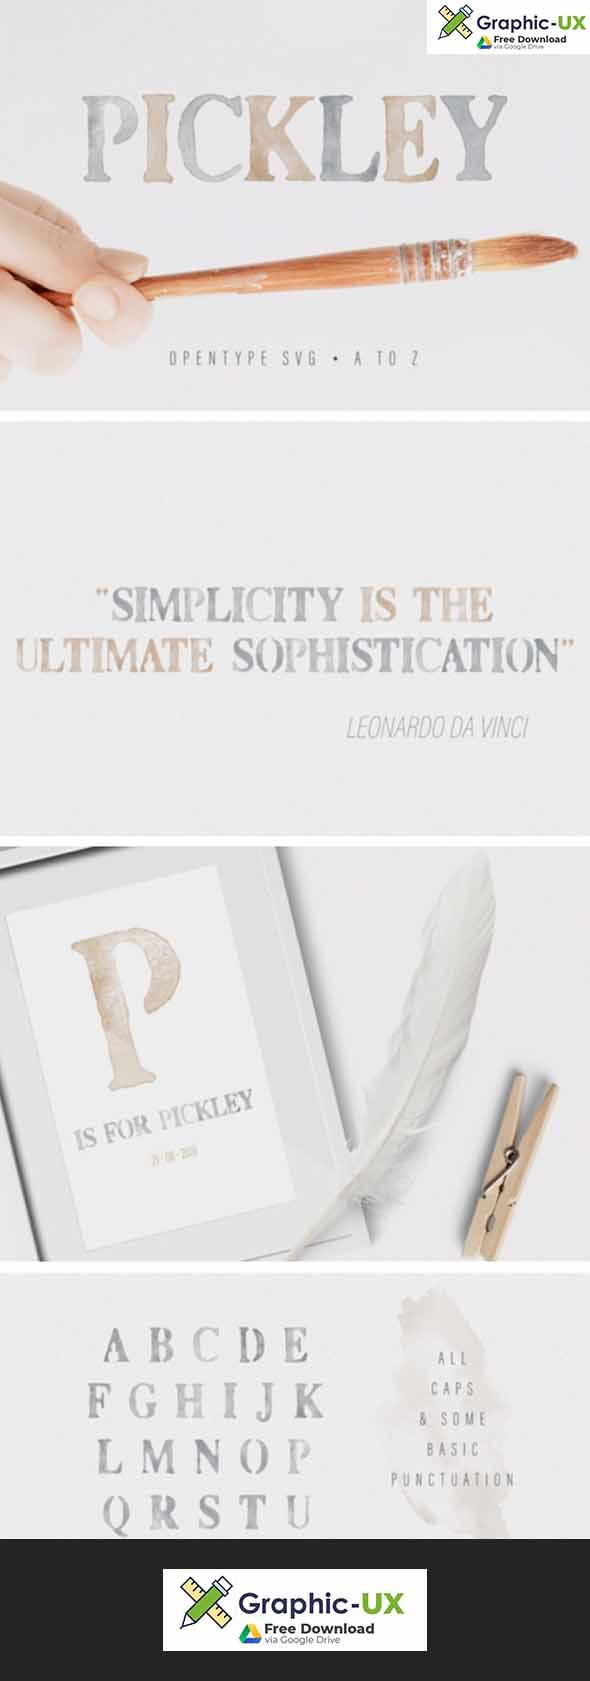 Pickley - Watercolor opentype SVG Font